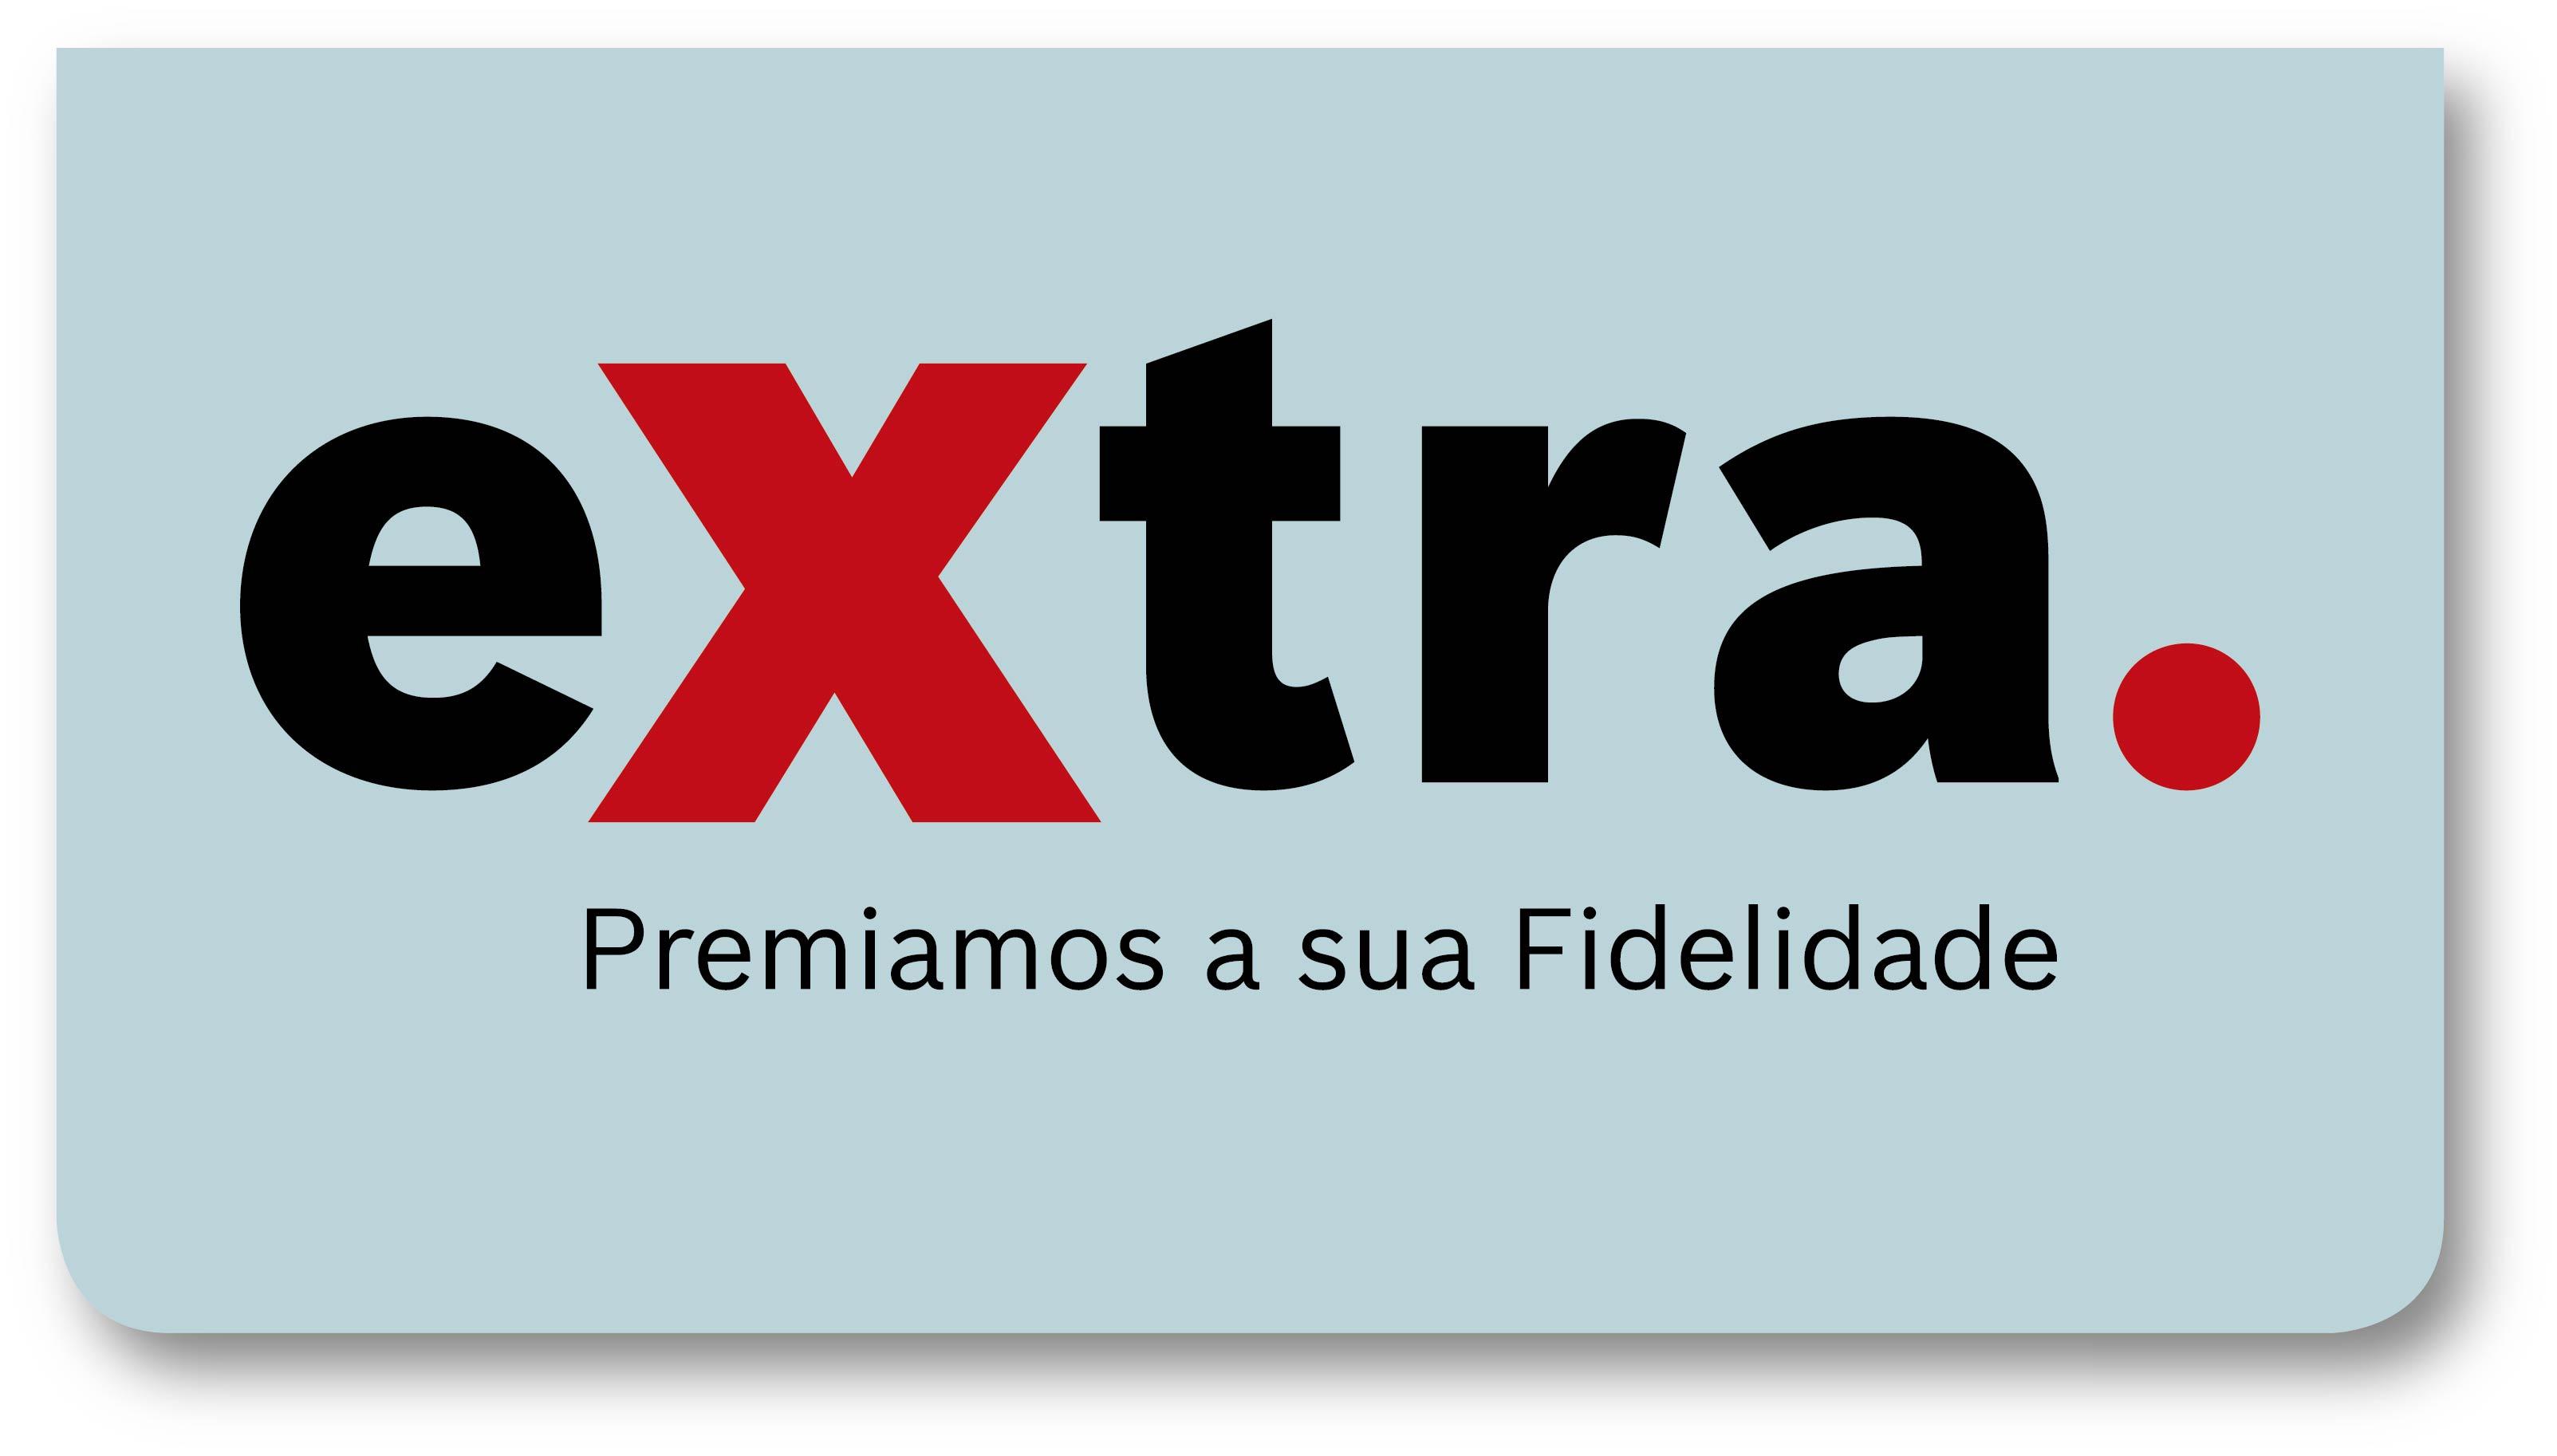 Logo: Programa de fidelidade eXtra